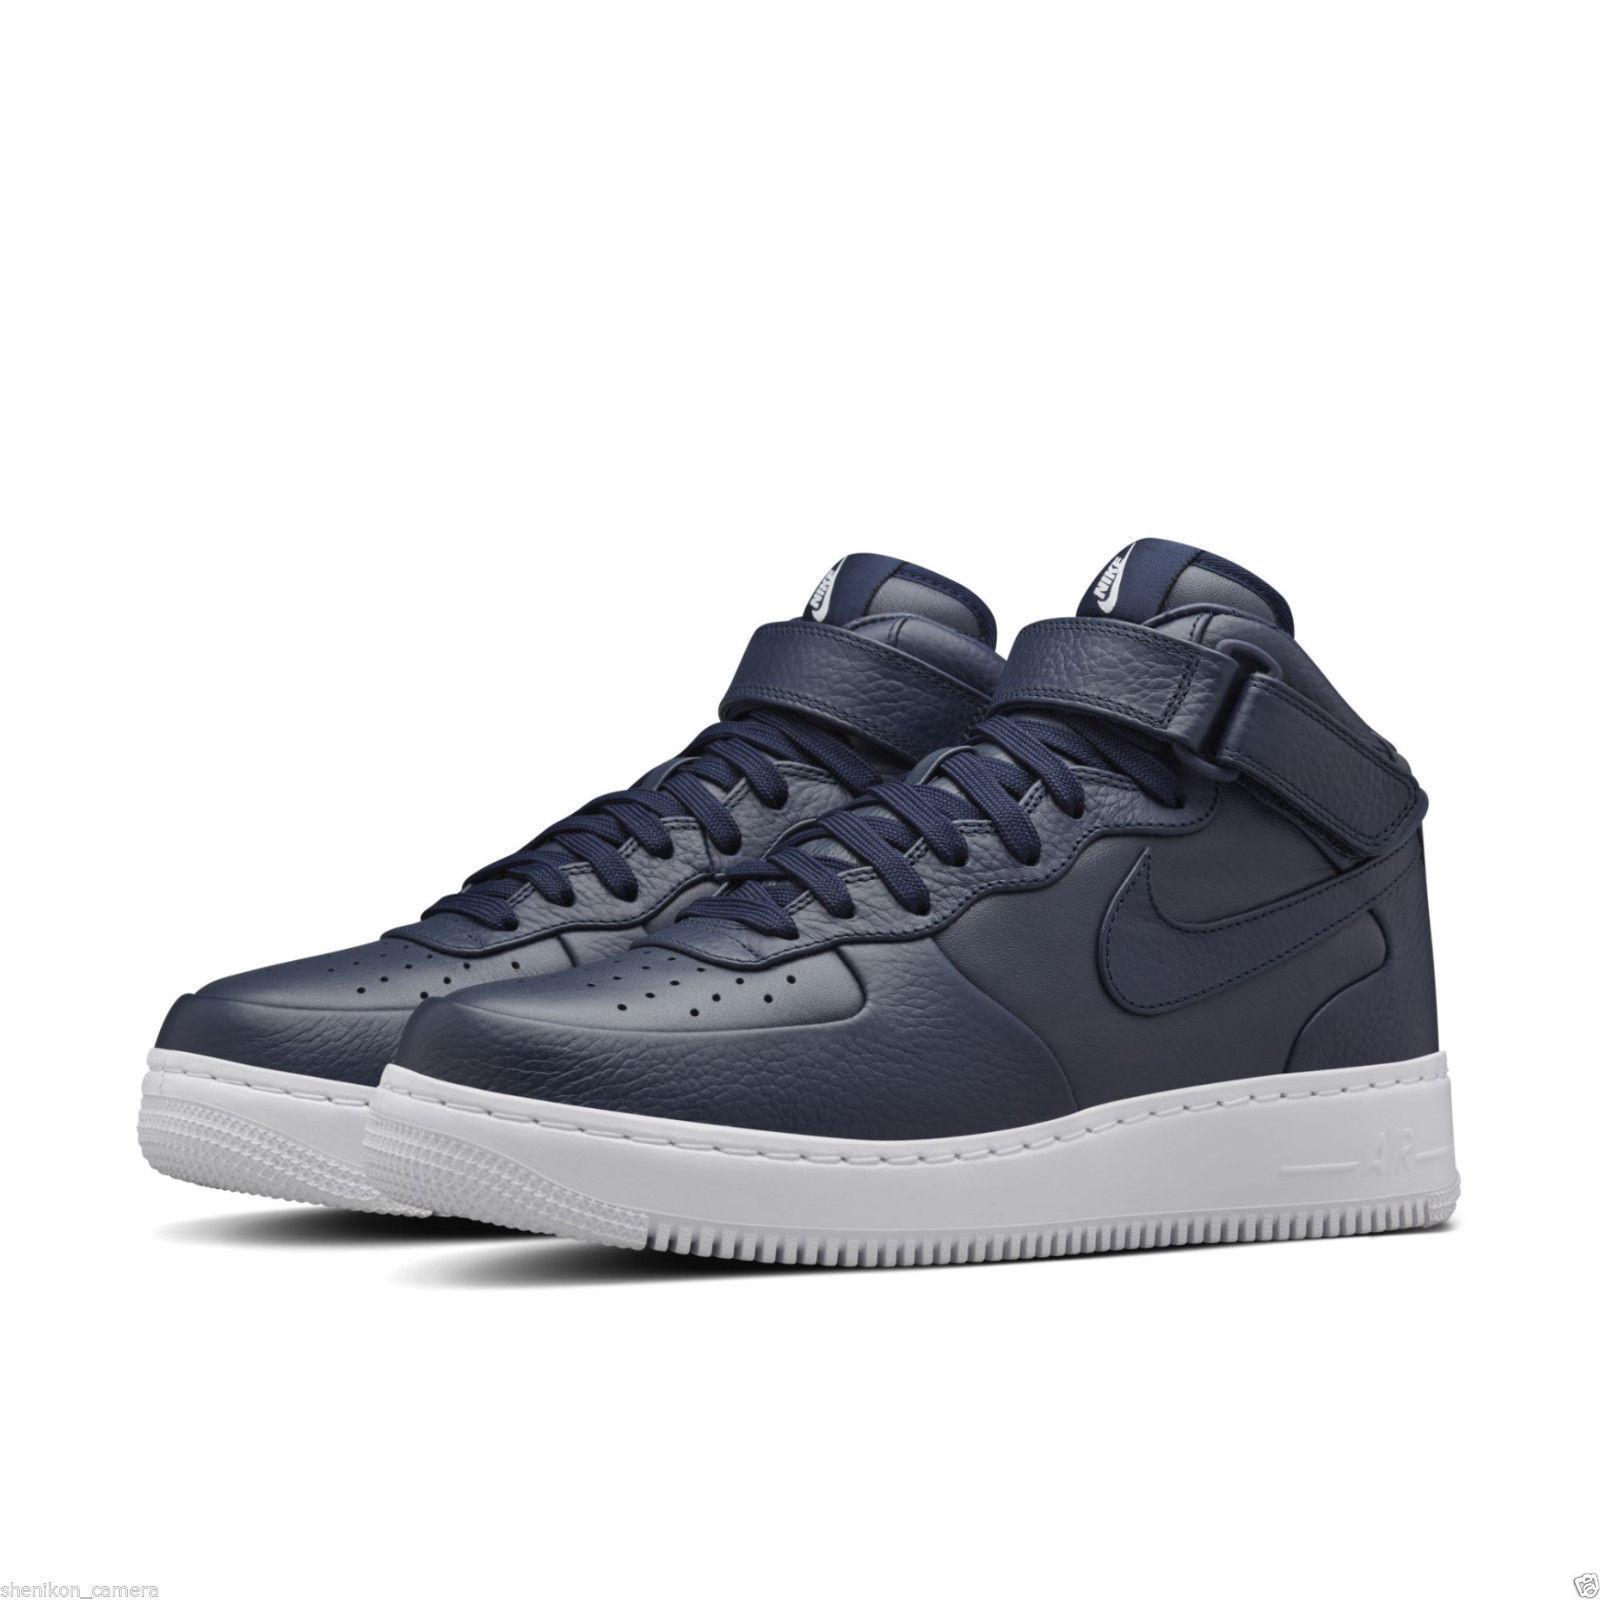 2016 NikeLab Air Force 1 Mid SP SZ 10 Obsidian bluee White Lux Nike 819677-400